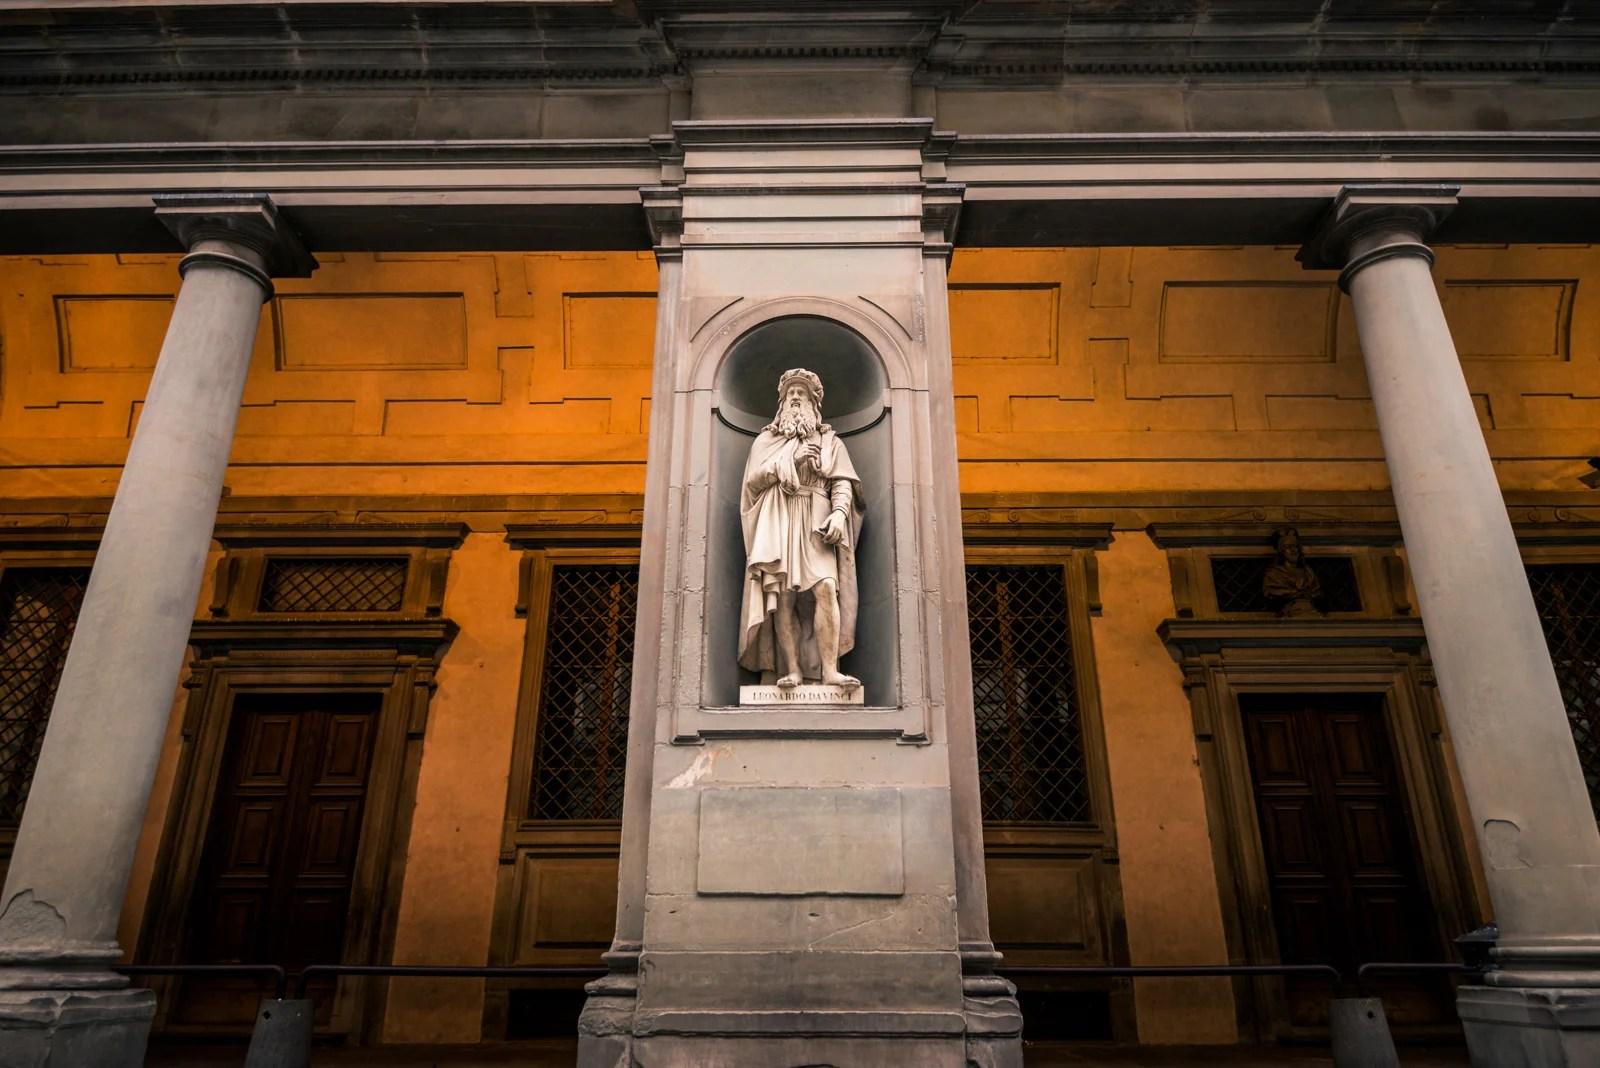 Leonardo Davinci Museum. (Photo by Reuben Teo Leo / Shutterstock)